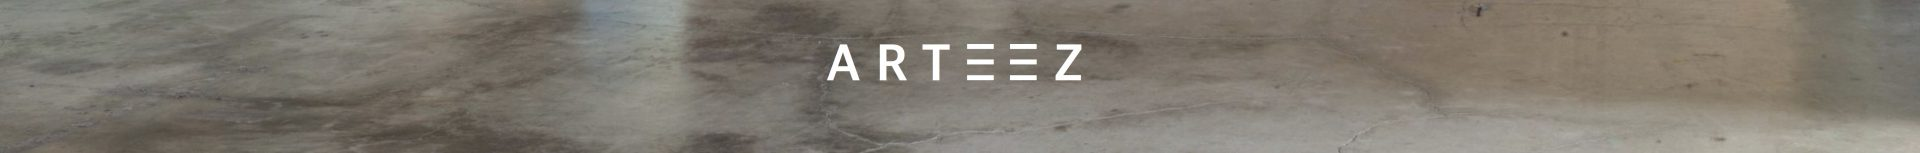 cropped-arteez_logo3.jpg